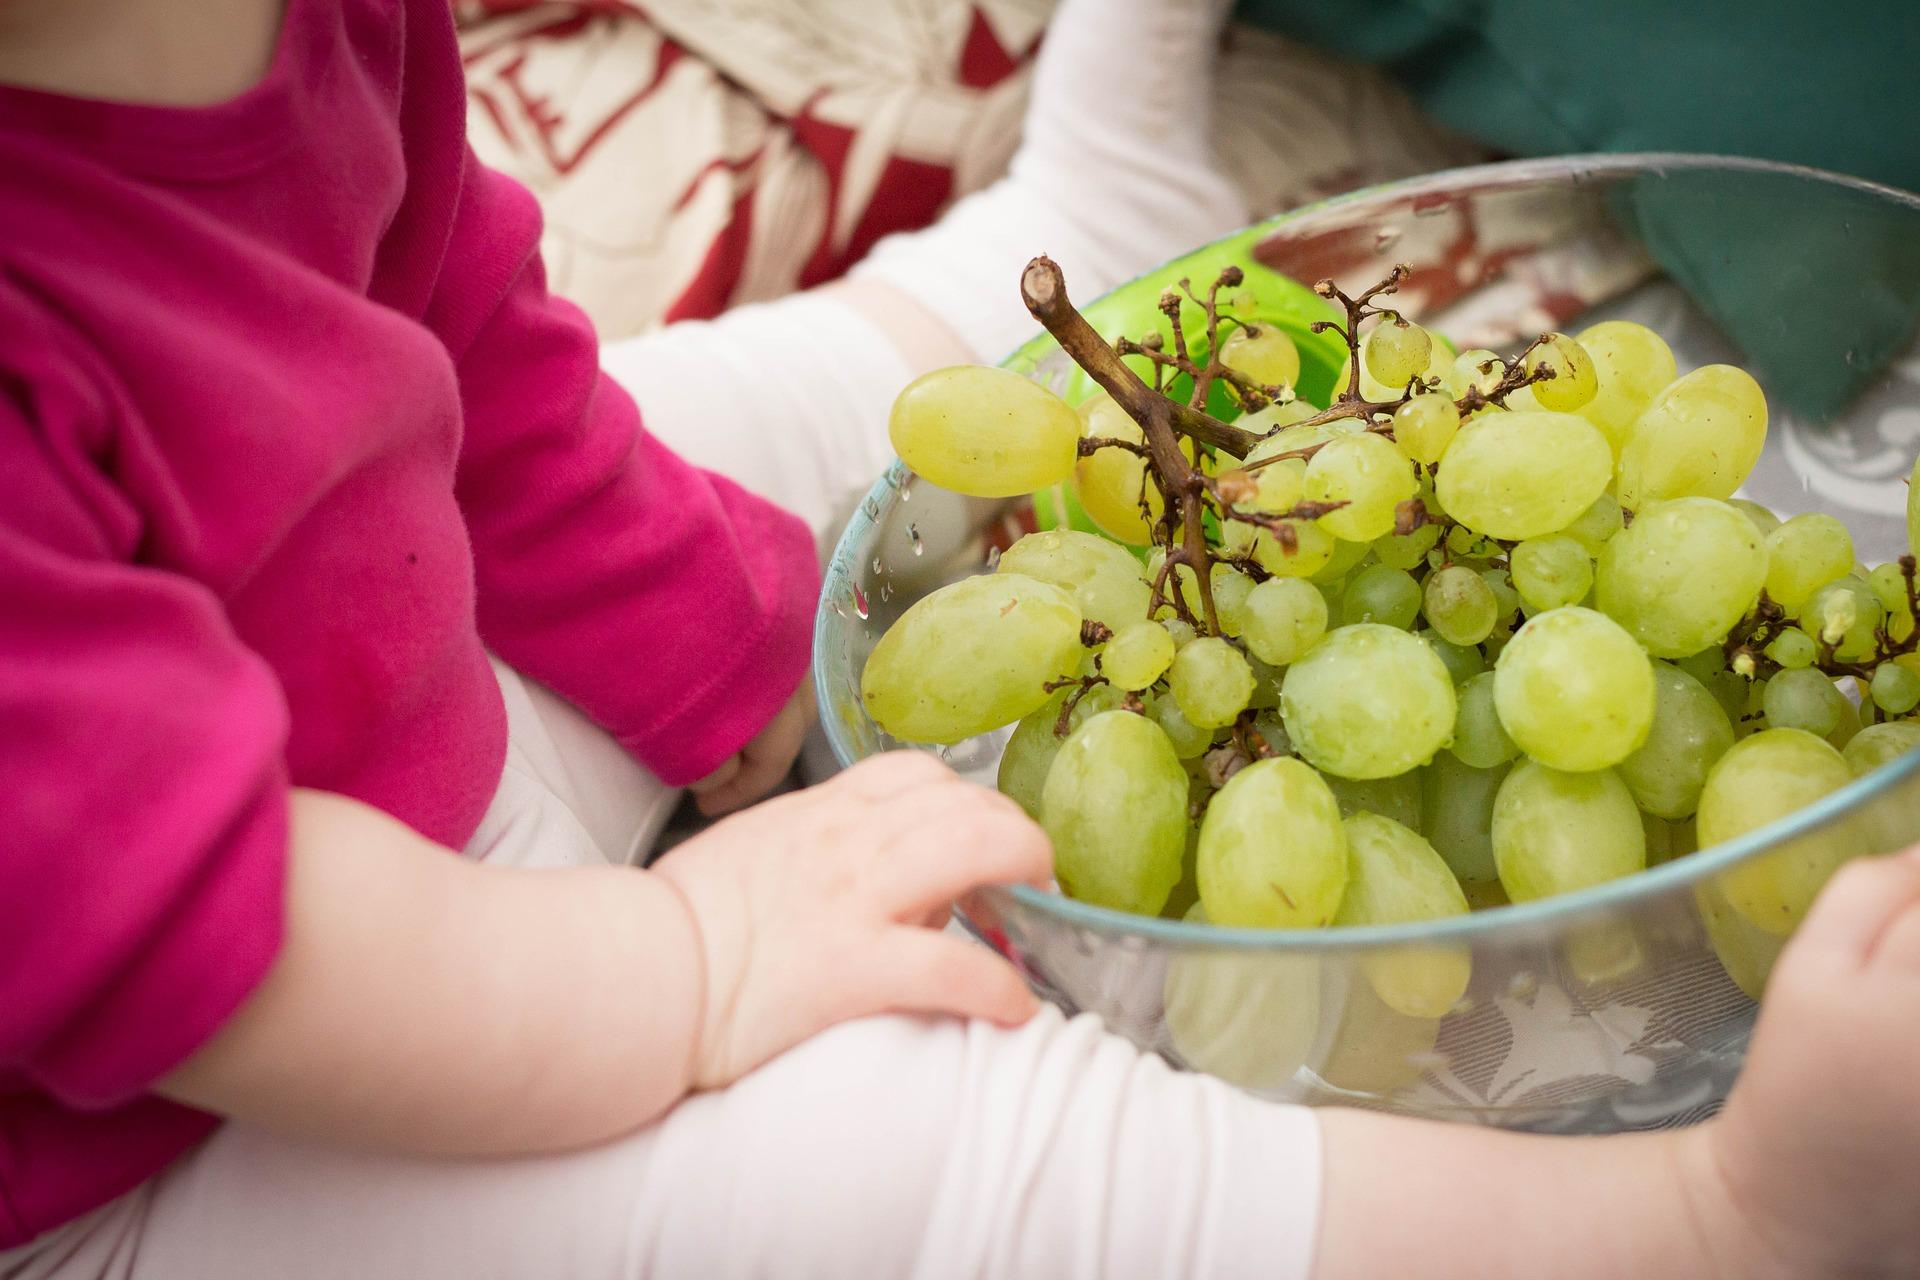 Recomendaciones de comida para bebés que empiezan a comer1 (2)